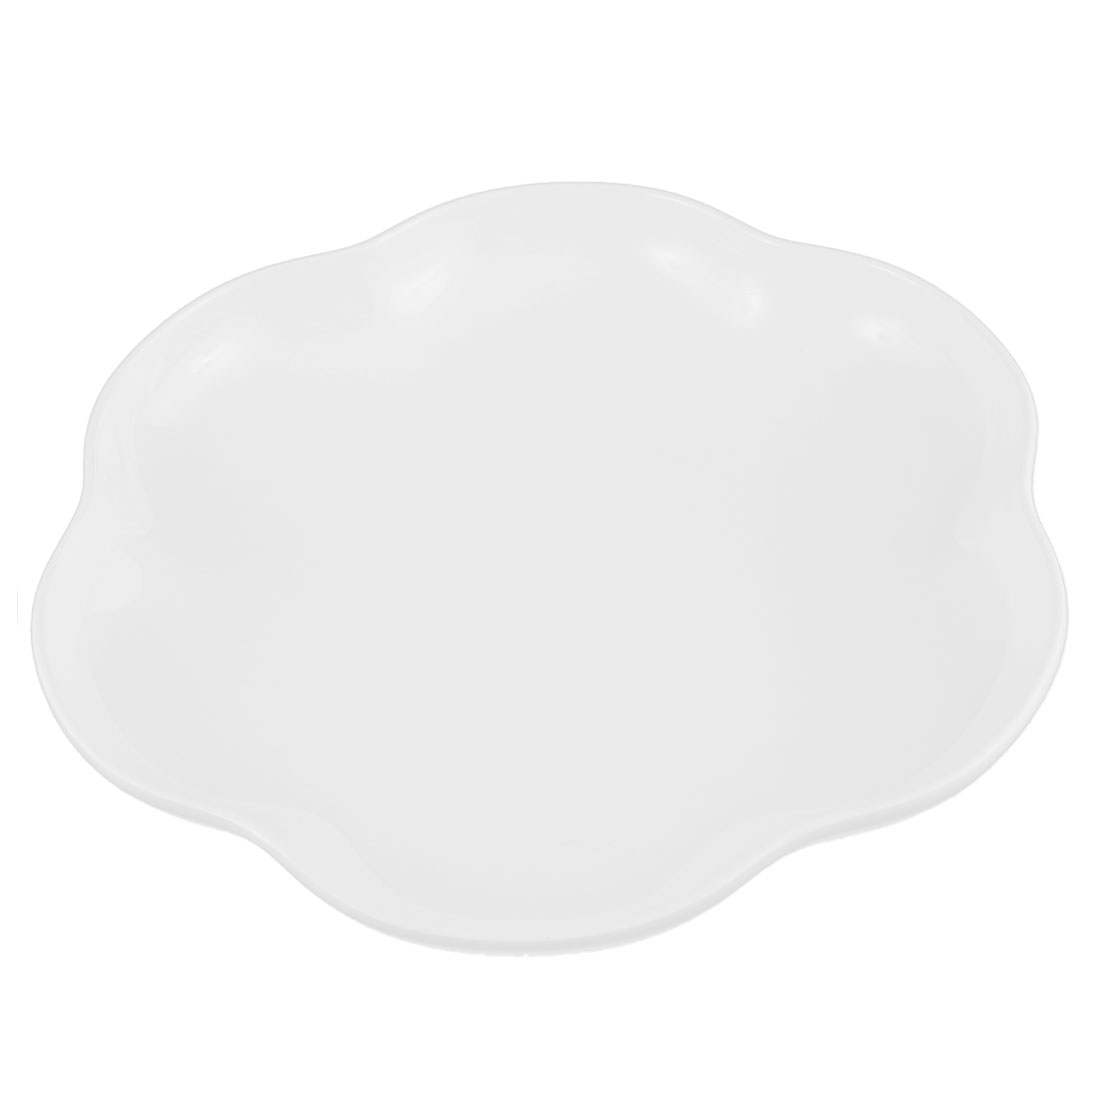 Home Plastic Lotus Shape Fruits Dessert Dish Plate White